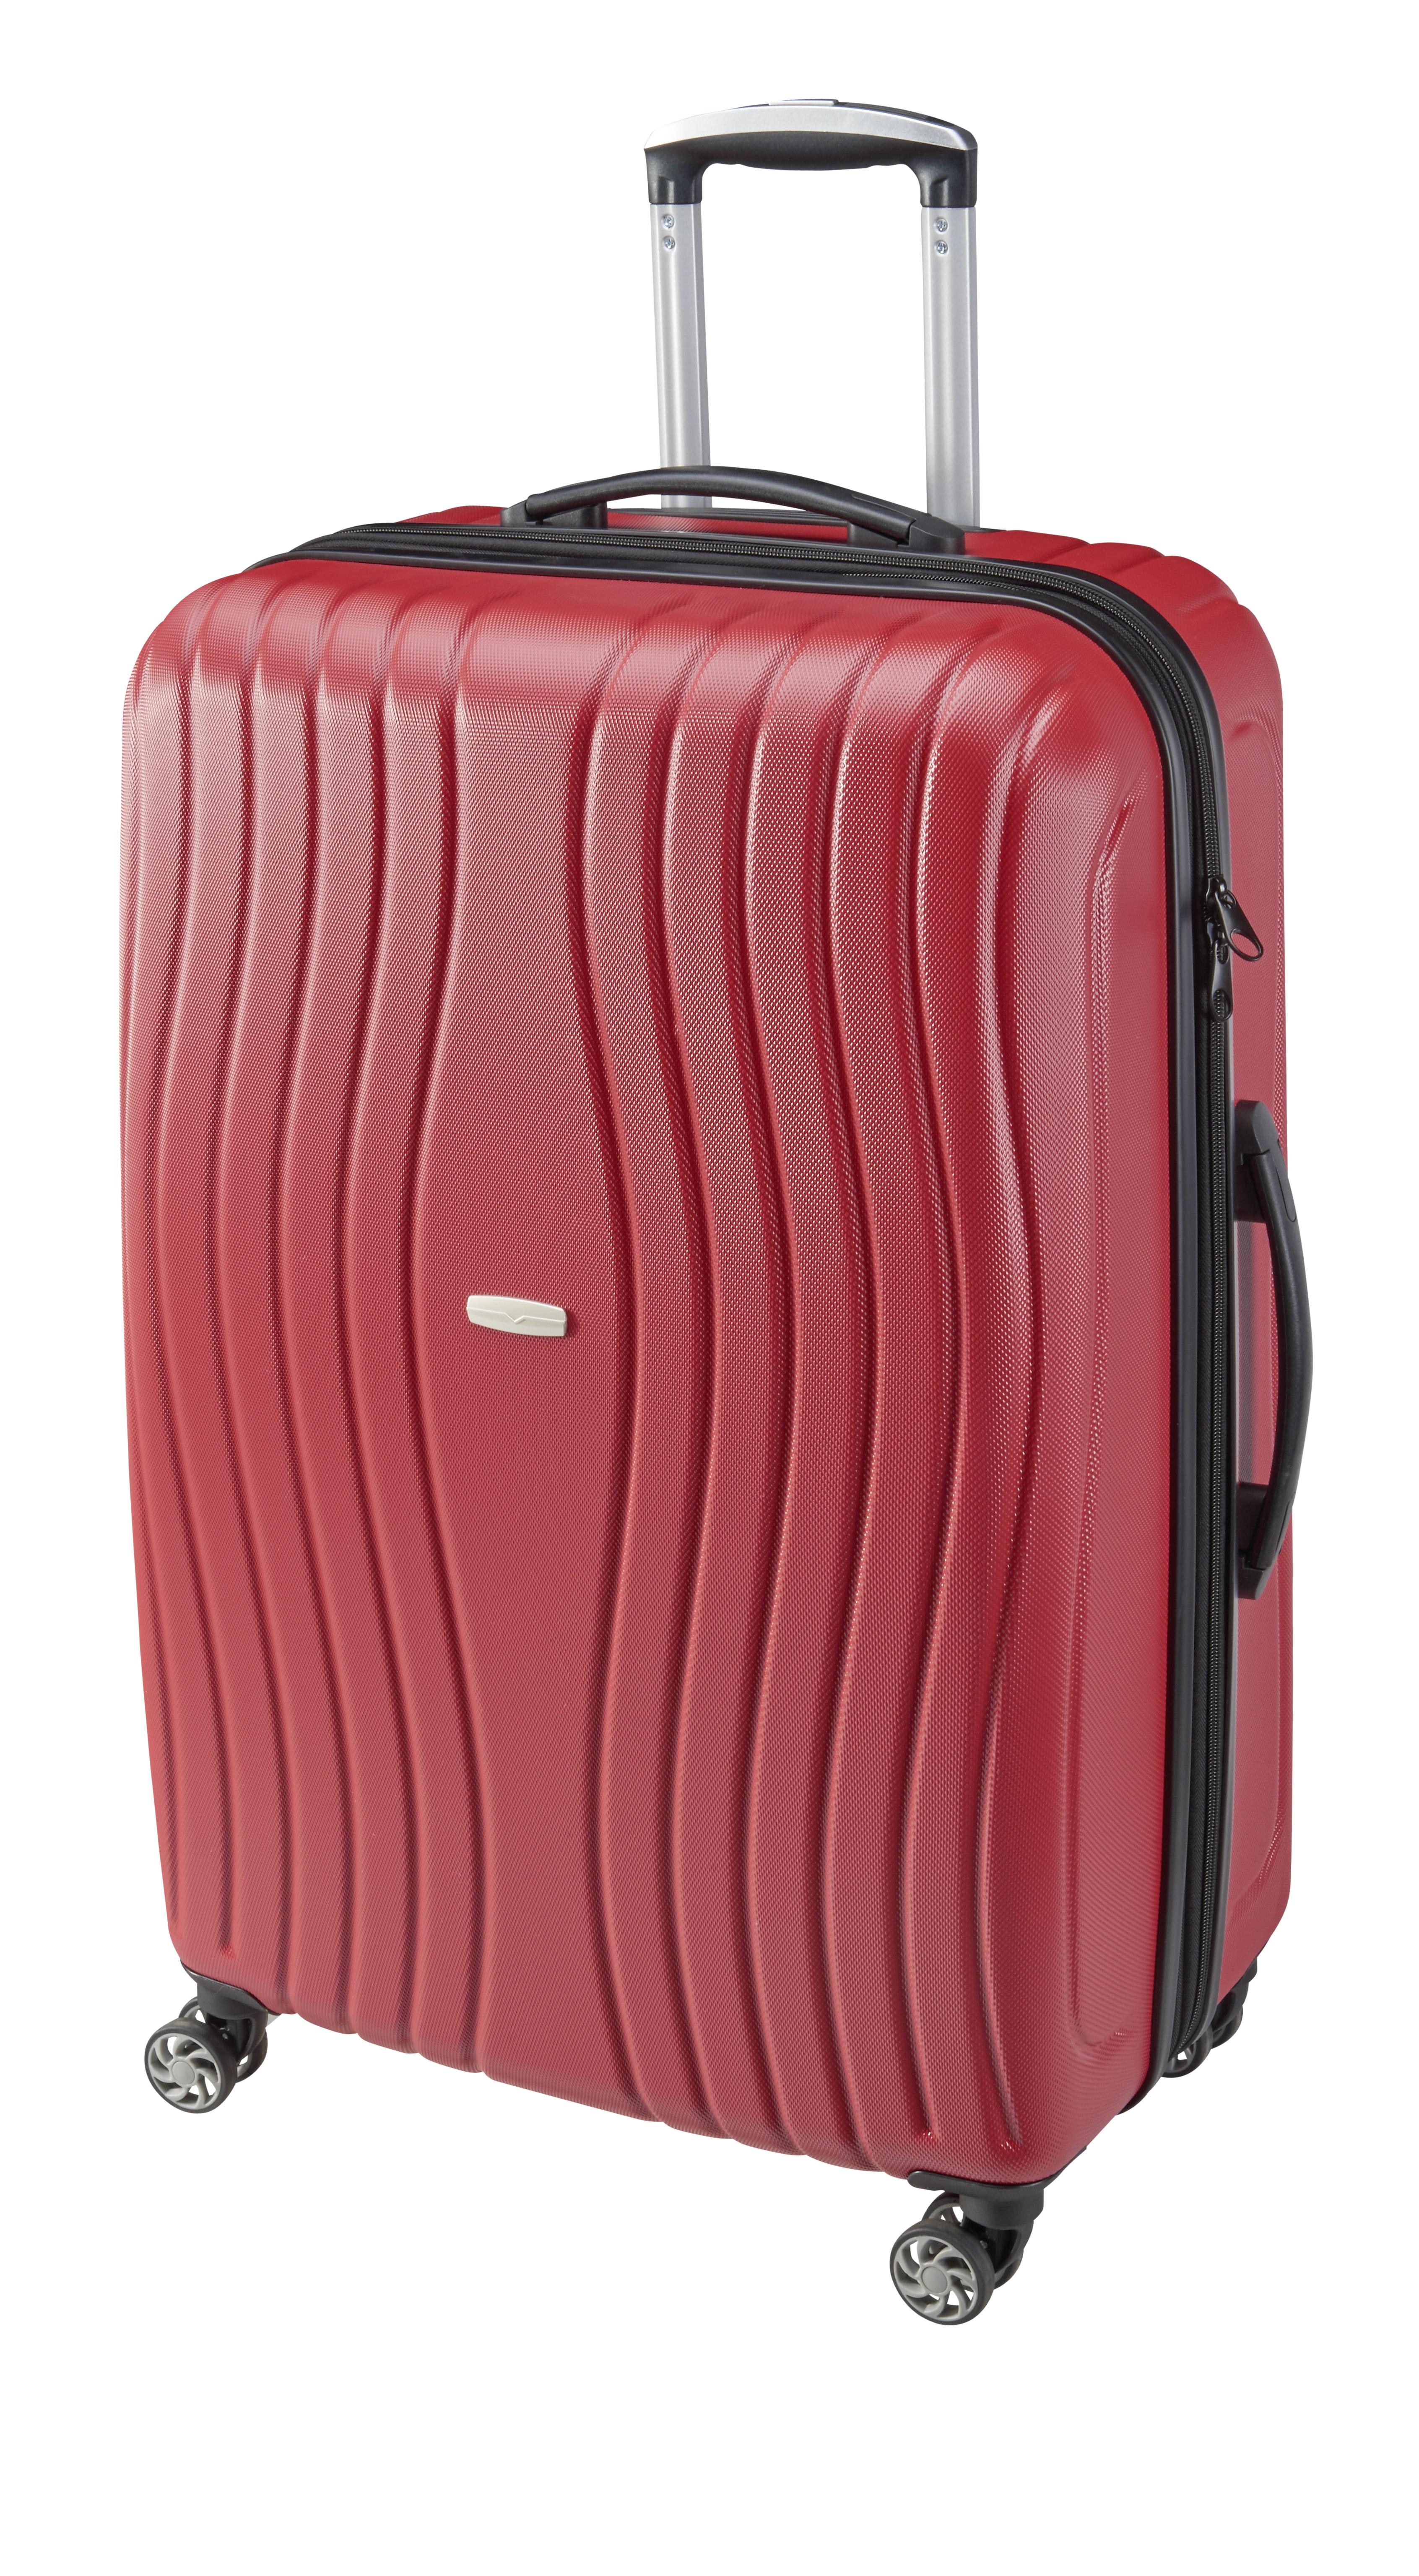 valise carrefour 4 roues https:--www.media-rdc.com-medias-dc2417a757a73351aa30991e226866d8-